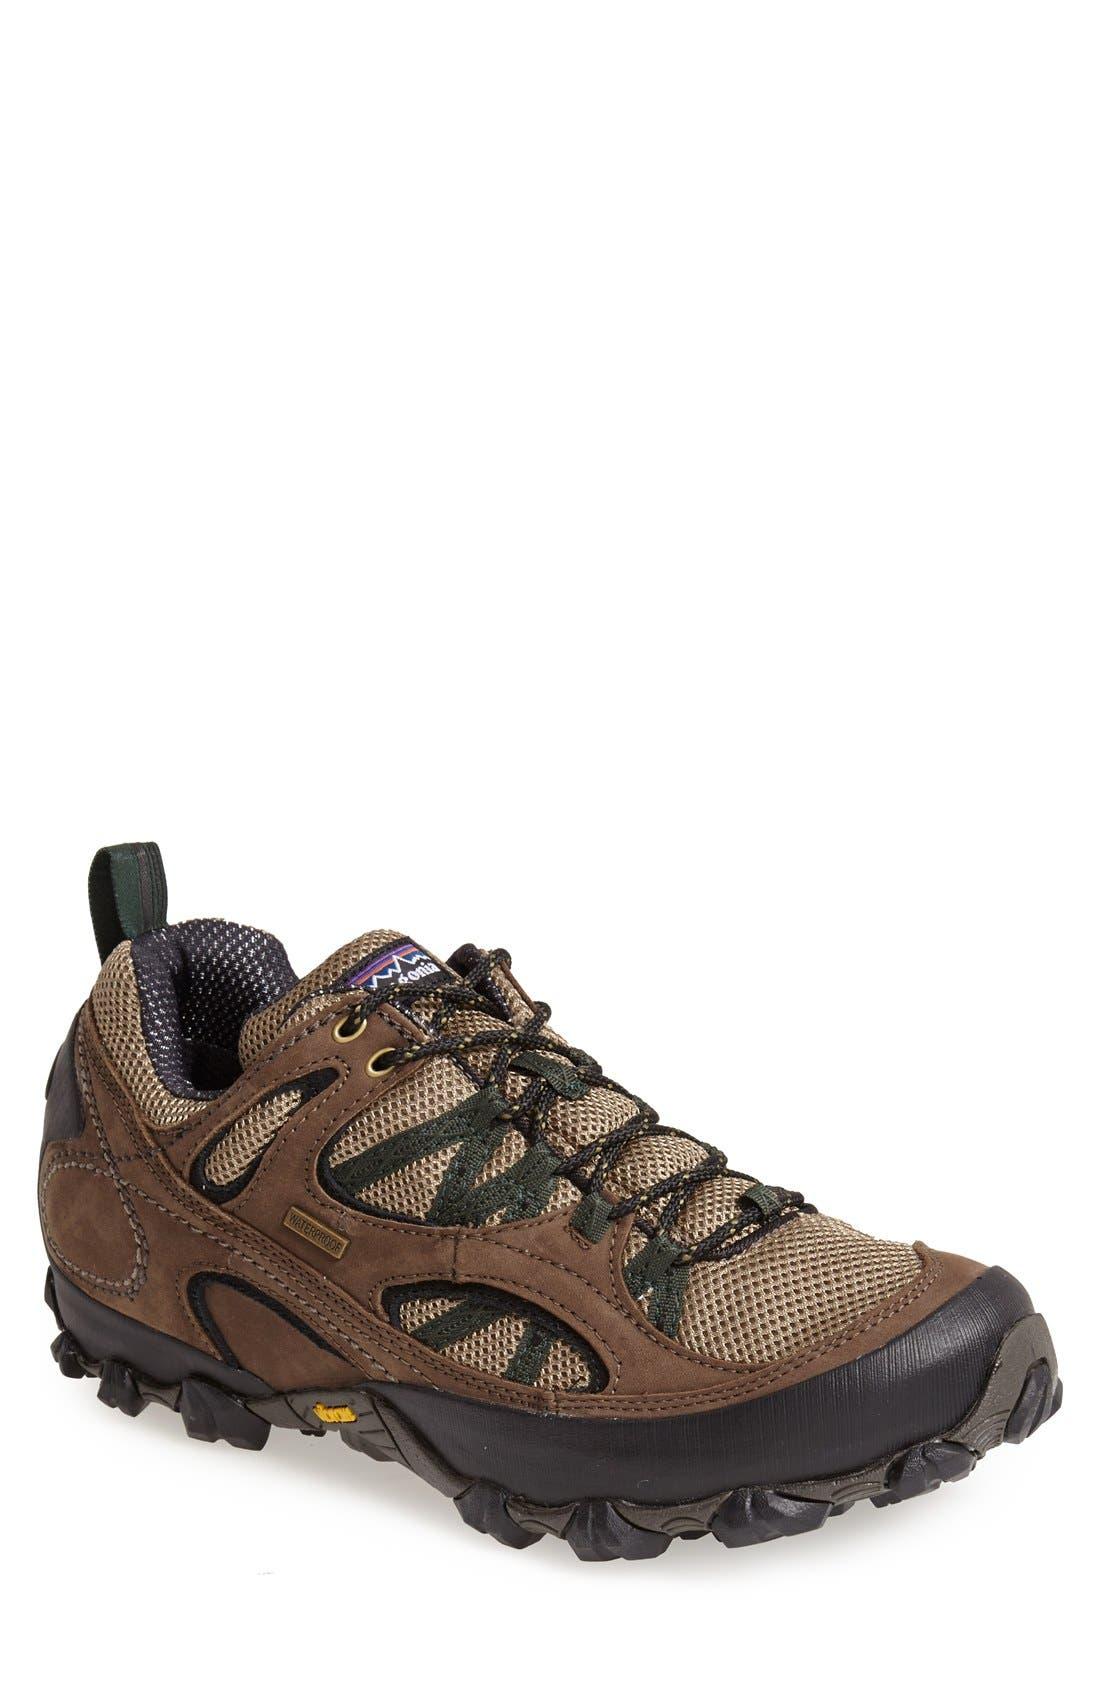 Alternate Image 1 Selected - Patagonia 'Drifter A/C' Waterproof Hiking Shoe (Men)